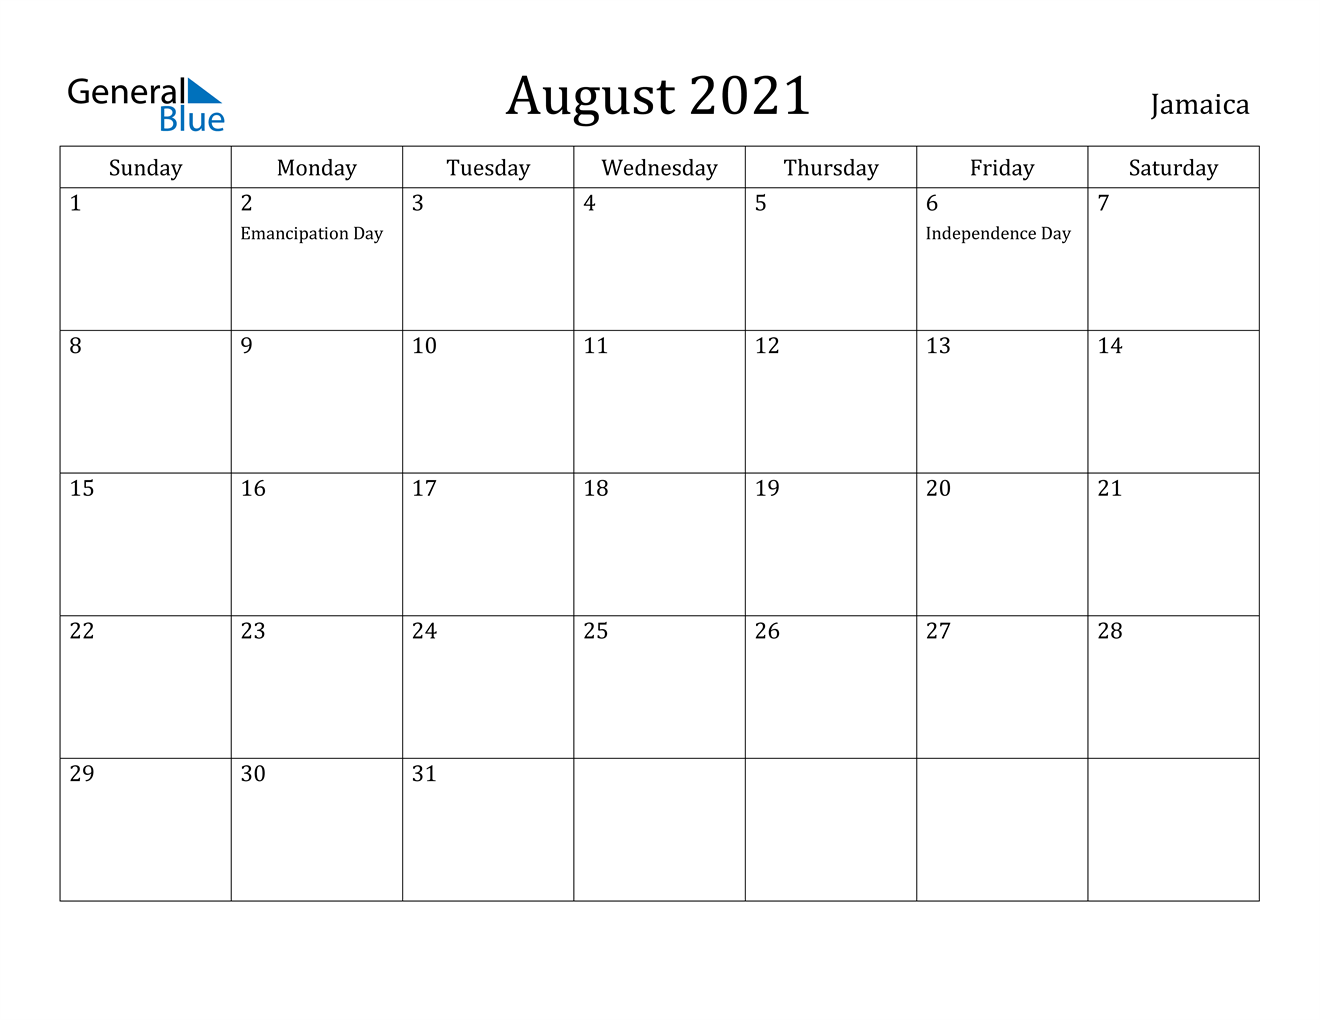 August 2021 Calendar - Jamaica